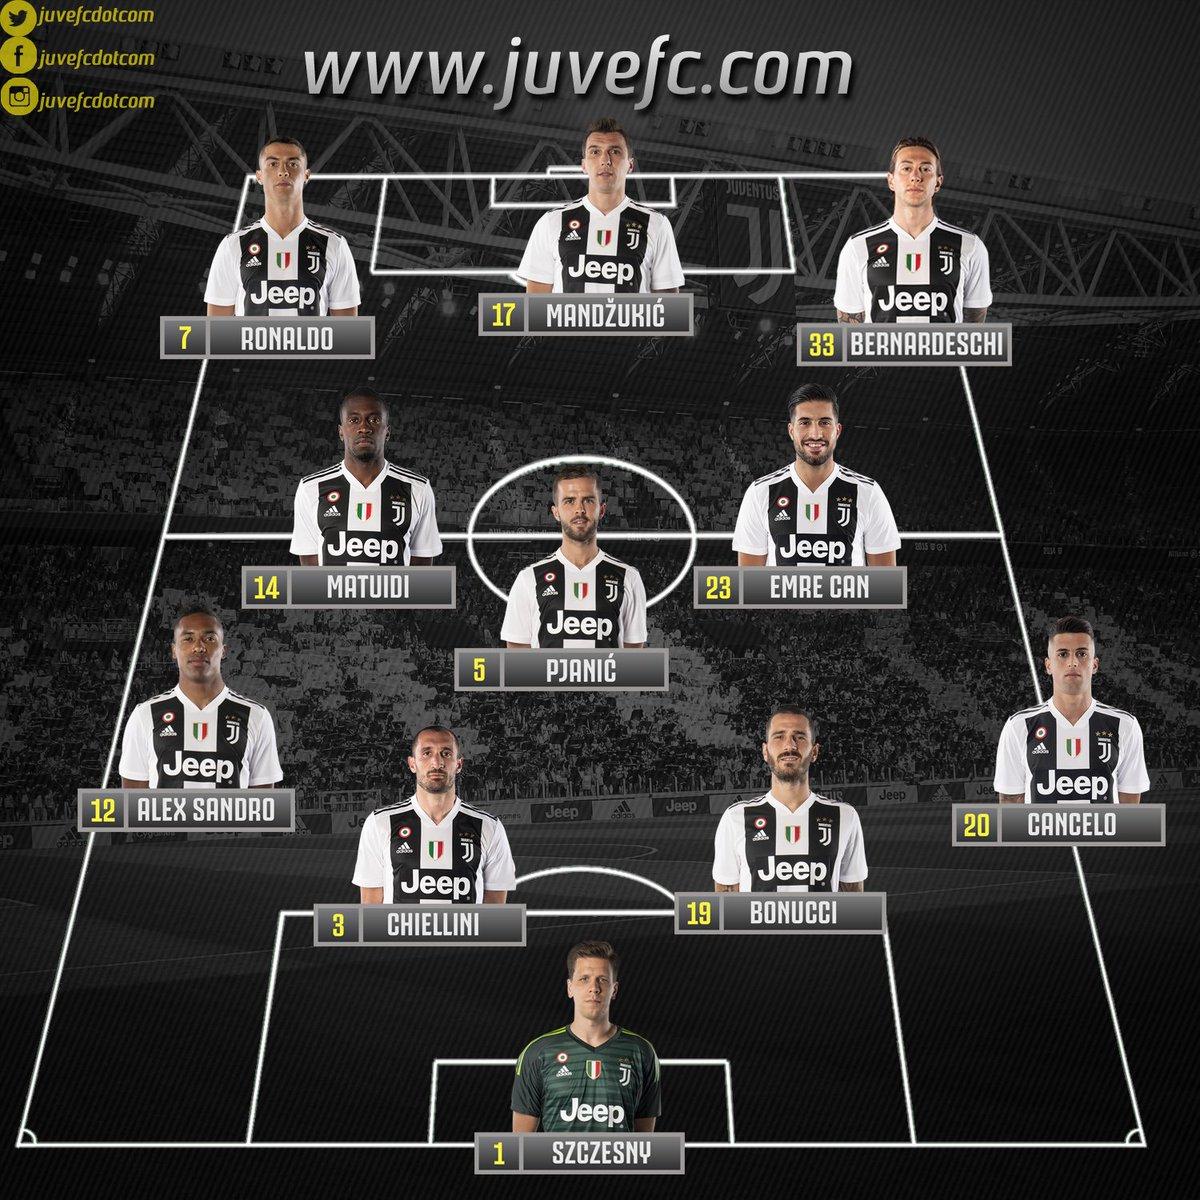 Juventus News Juvefc Com On Twitter Expected Juventus Xi Today Napolijuve